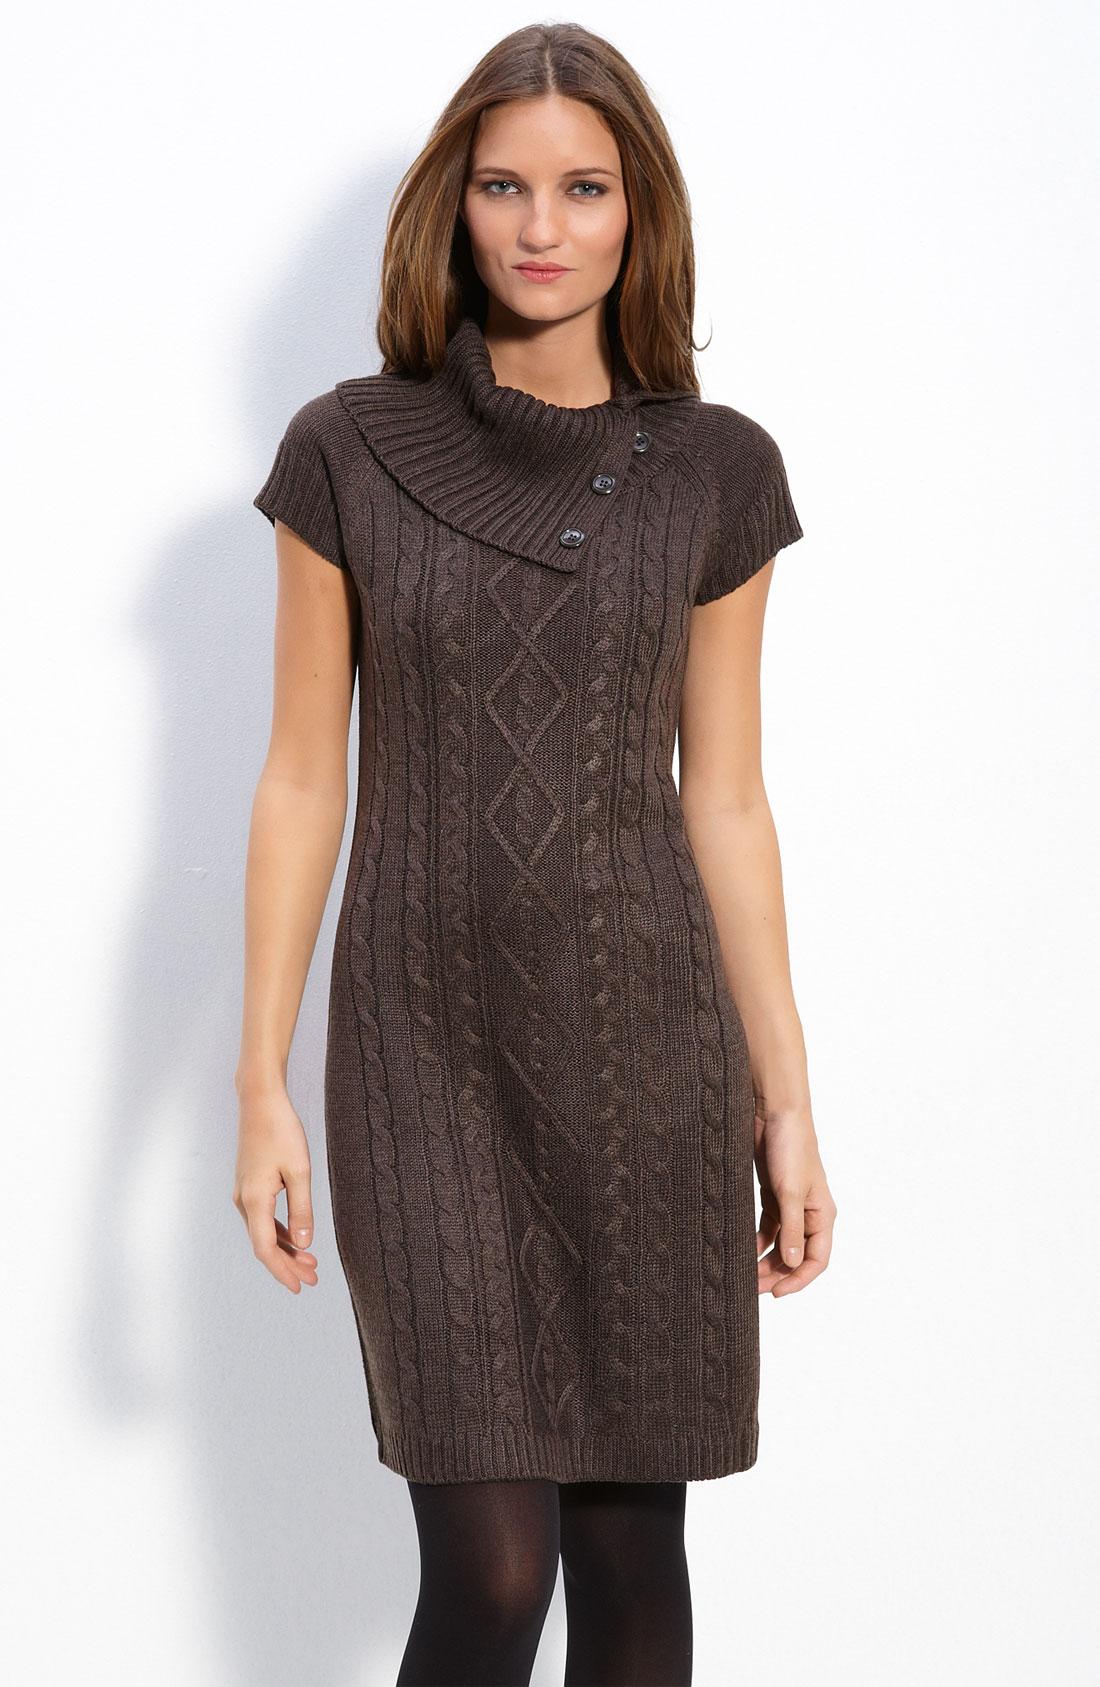 calvin klein foldover collar sweater dress in brown. Black Bedroom Furniture Sets. Home Design Ideas